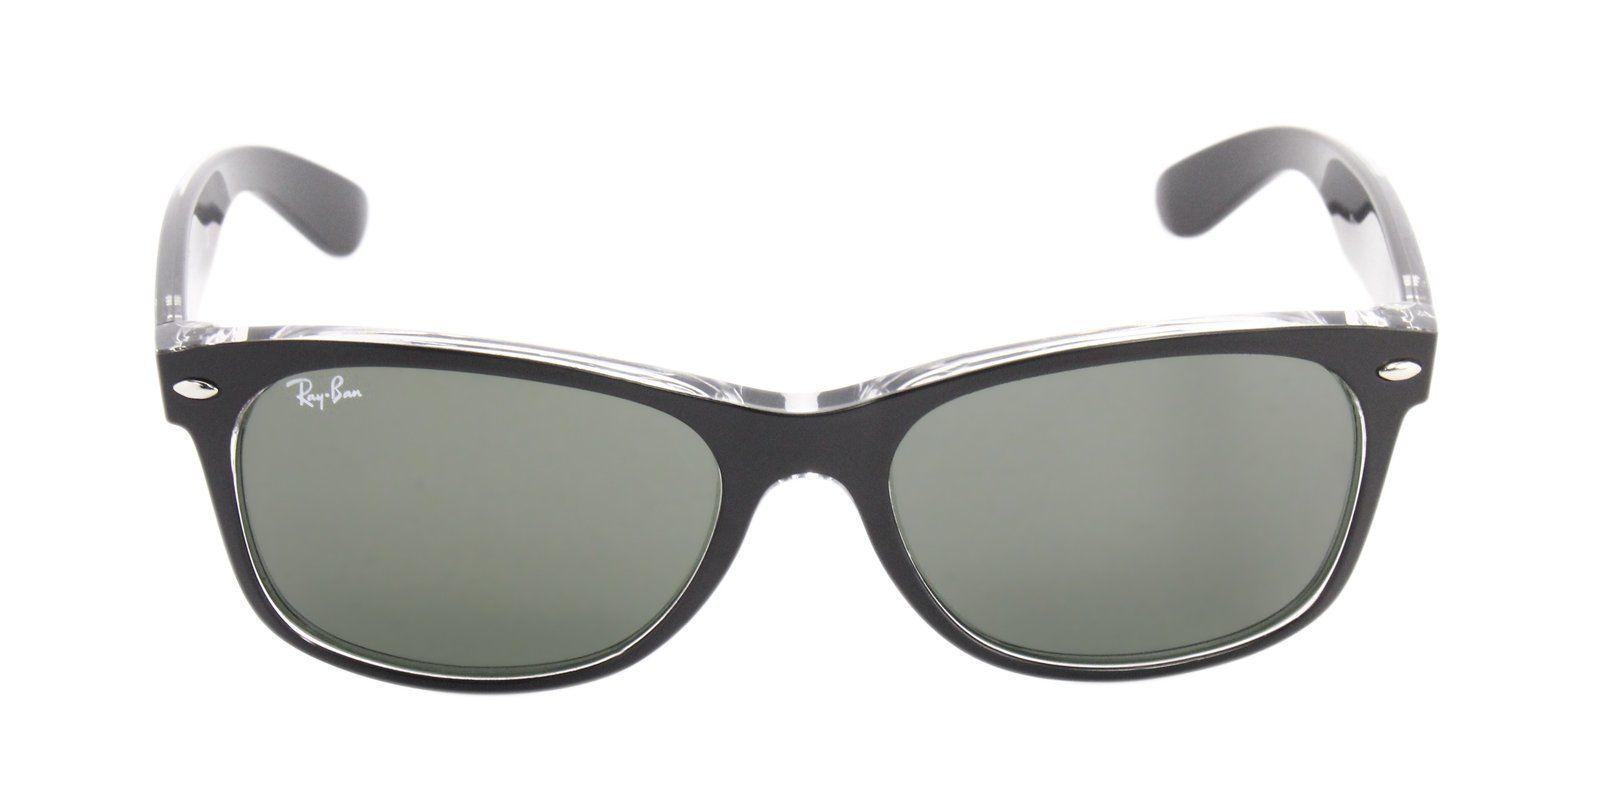 48c759d3cd77d Ray Ban - New Wayfarer Black - Gray sunglasses in 2019